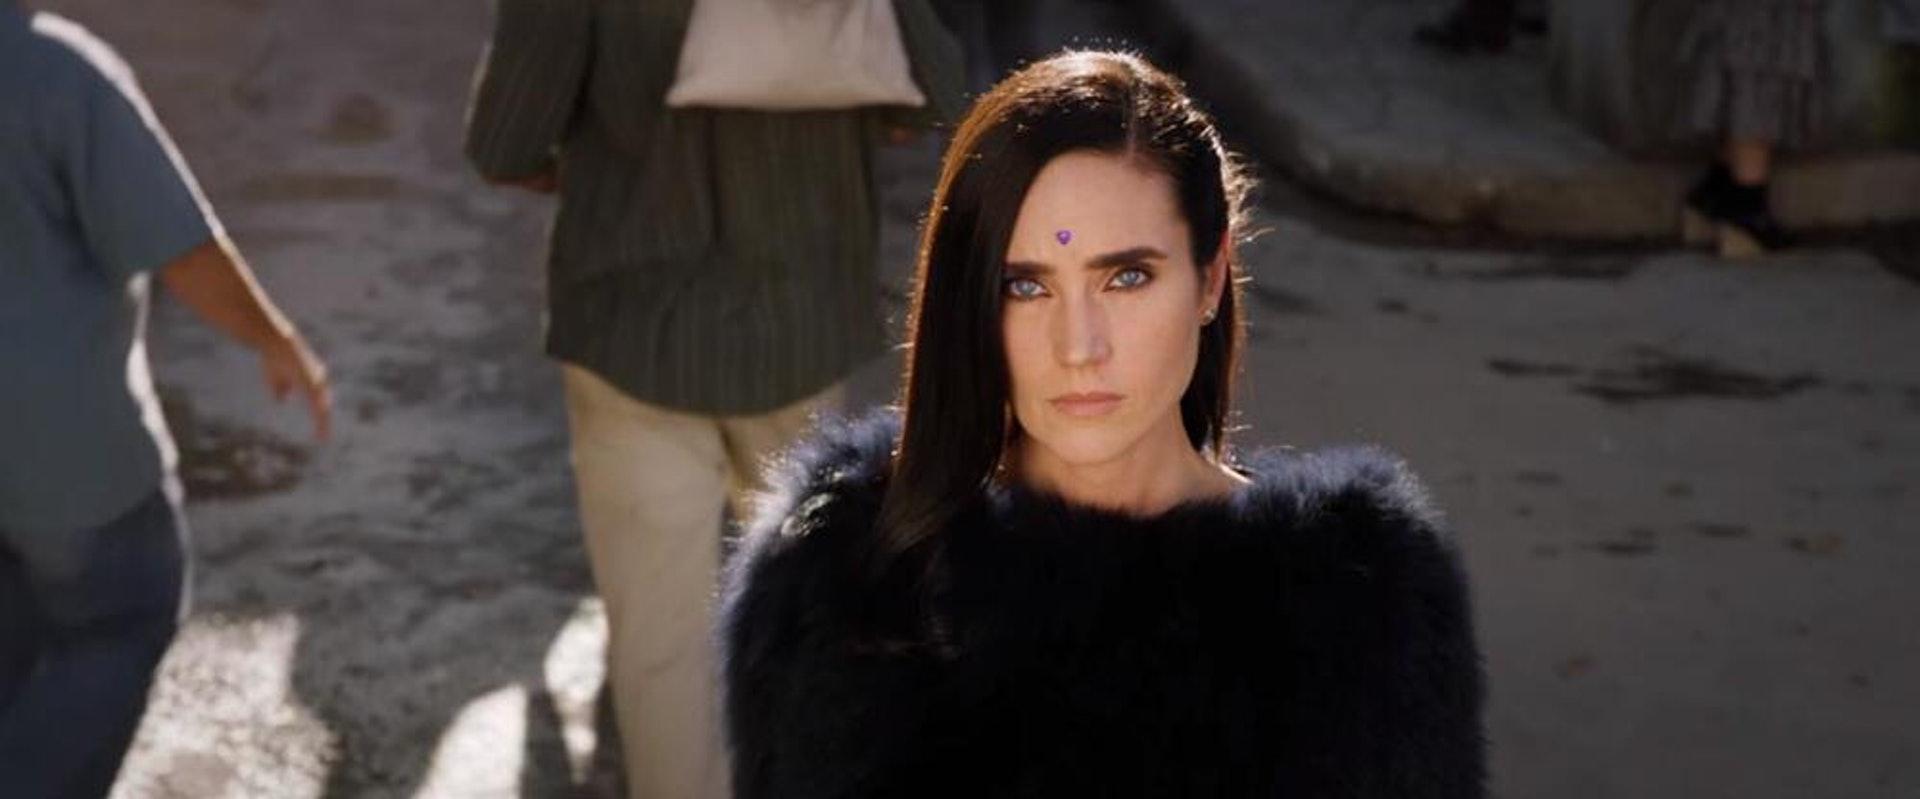 Jennifer Lynn Connelly喺《銃夢:戰鬥天使》飾演Chiren。(劇照)